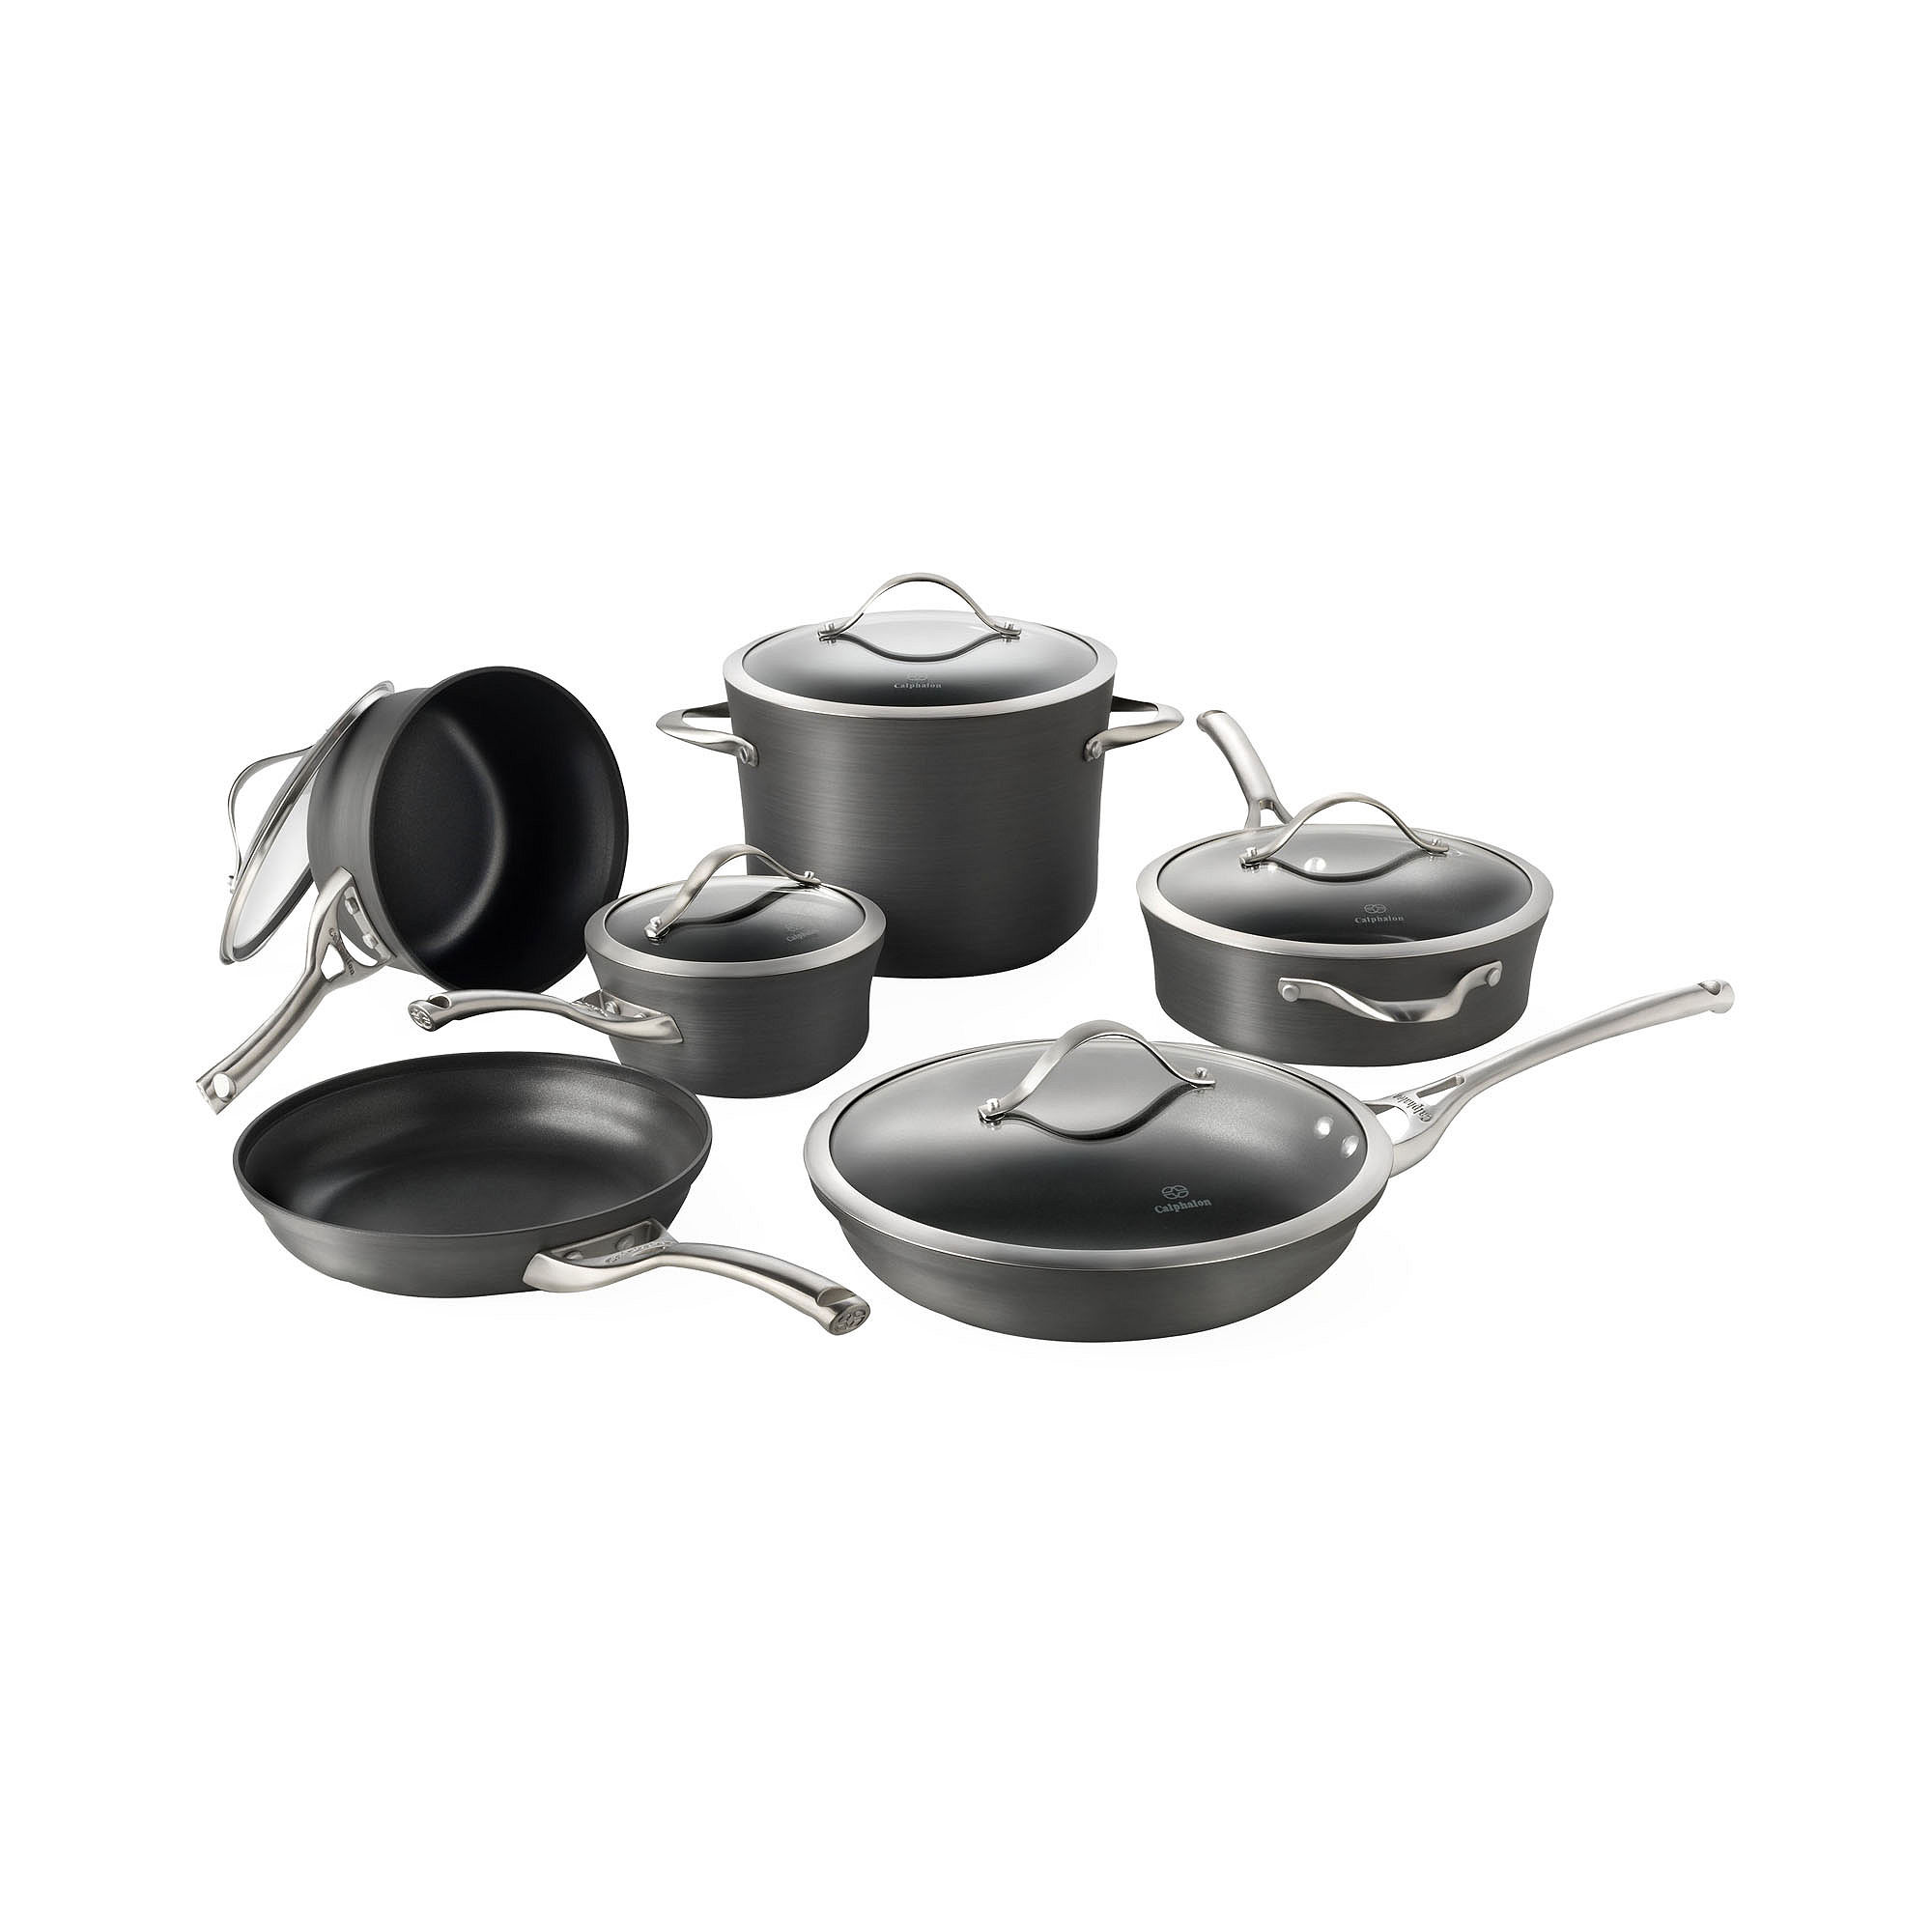 Cheap tramontina gourmet 12 pc tri ply clad 18 10 for La cuisine 29 x 26cm cast iron grill pan